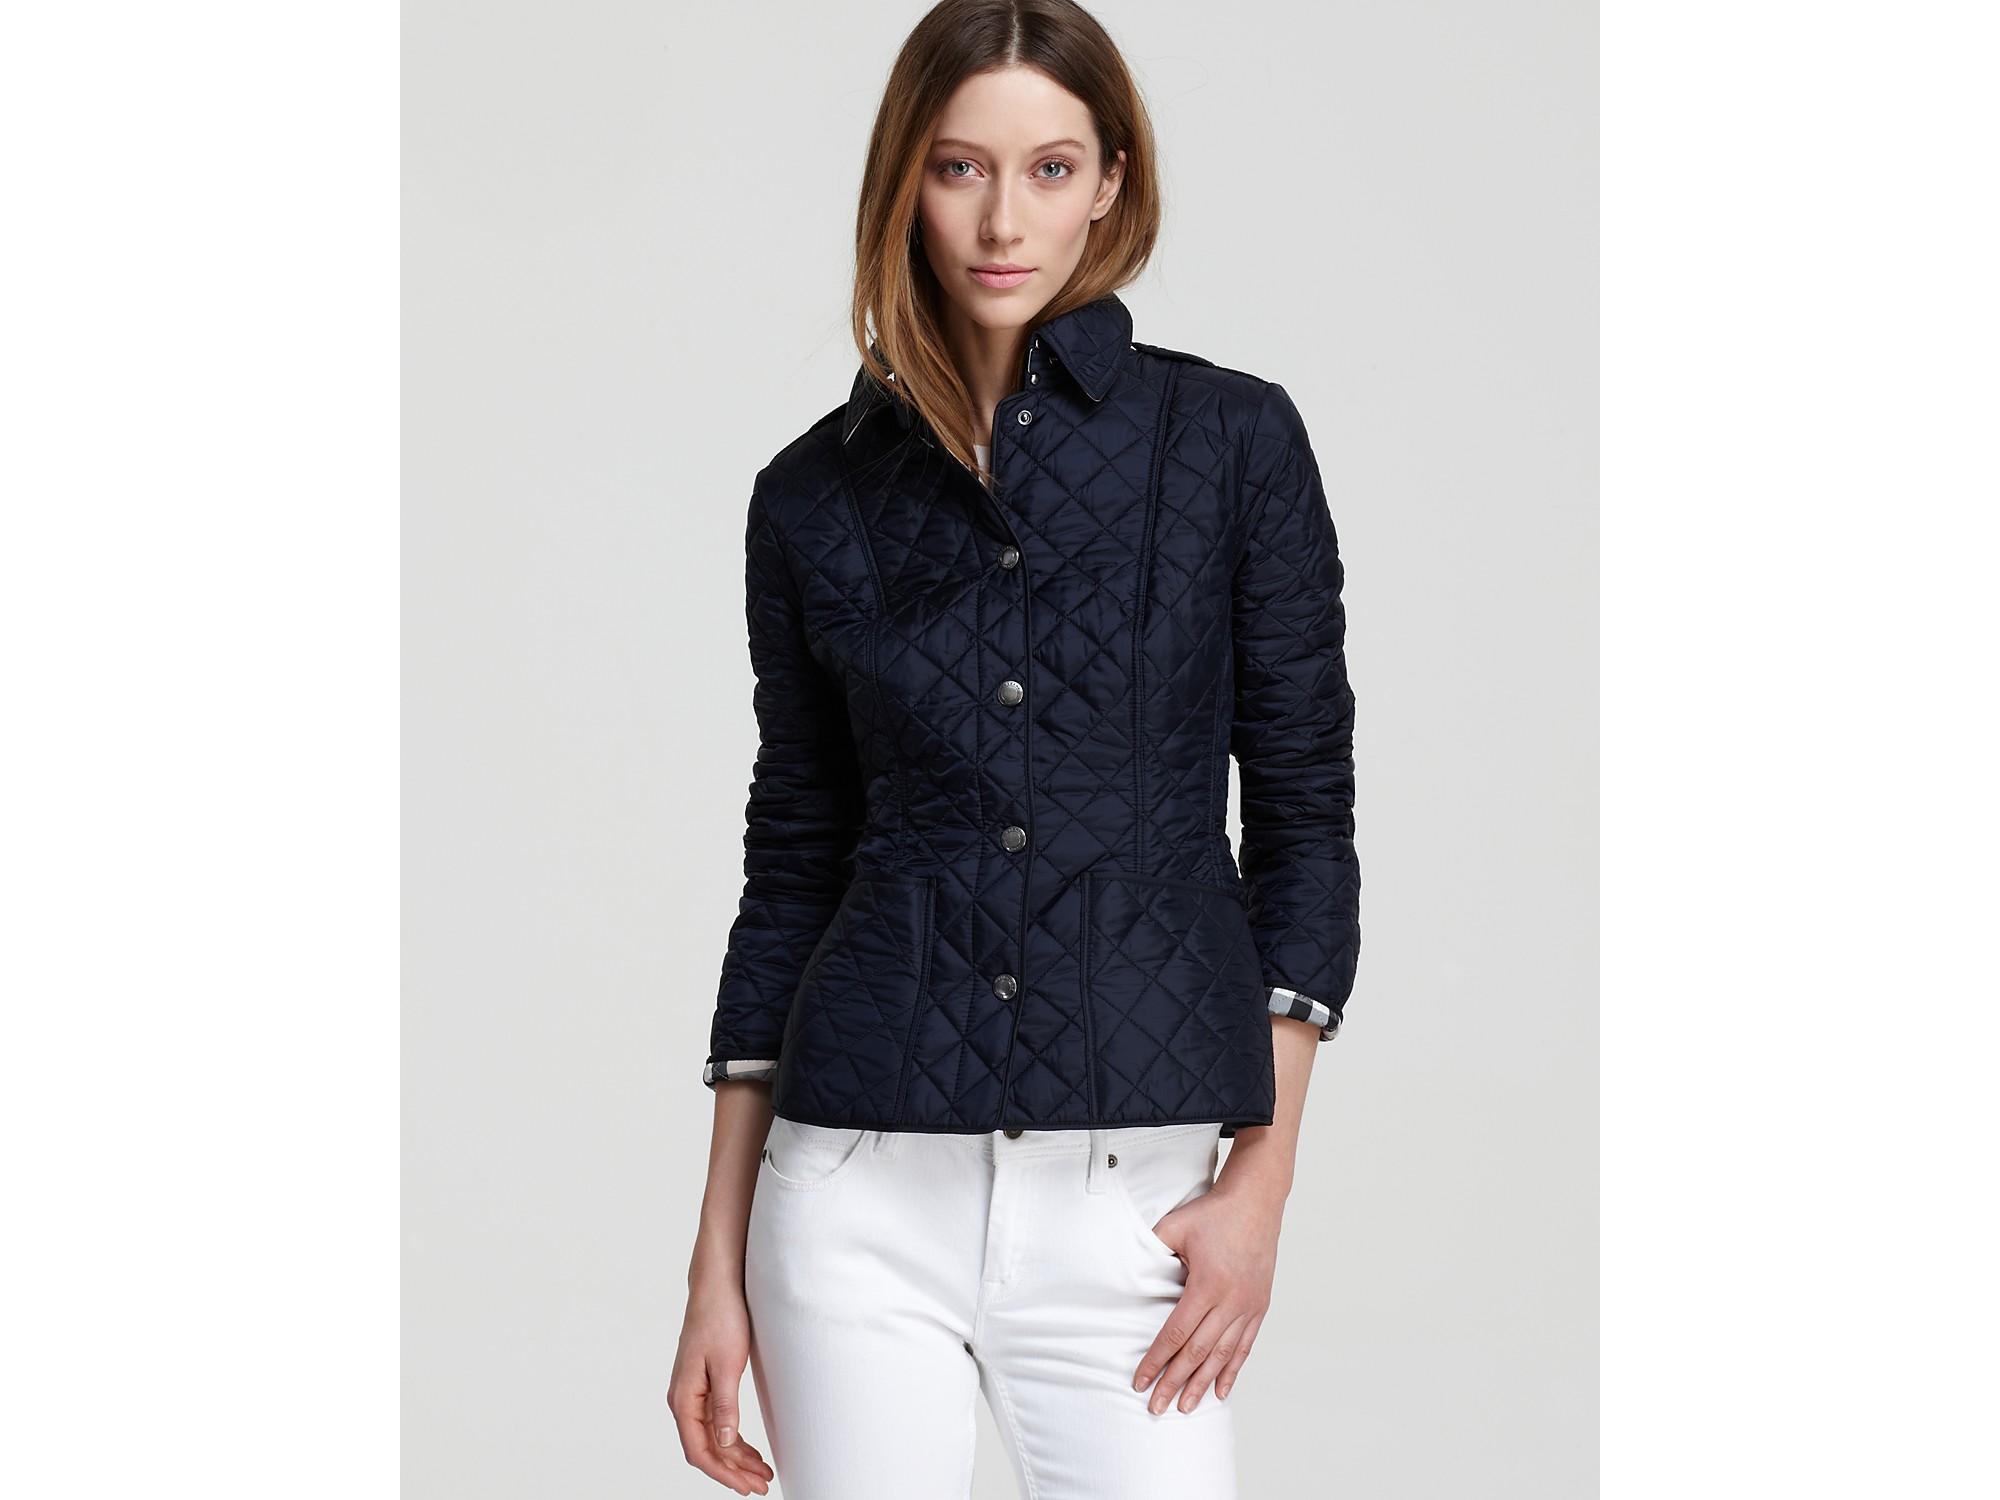 Burberry Kencott Lightweight Quilt Jacket in Blue   Lyst : burberry brit kencott quilted jacket - Adamdwight.com